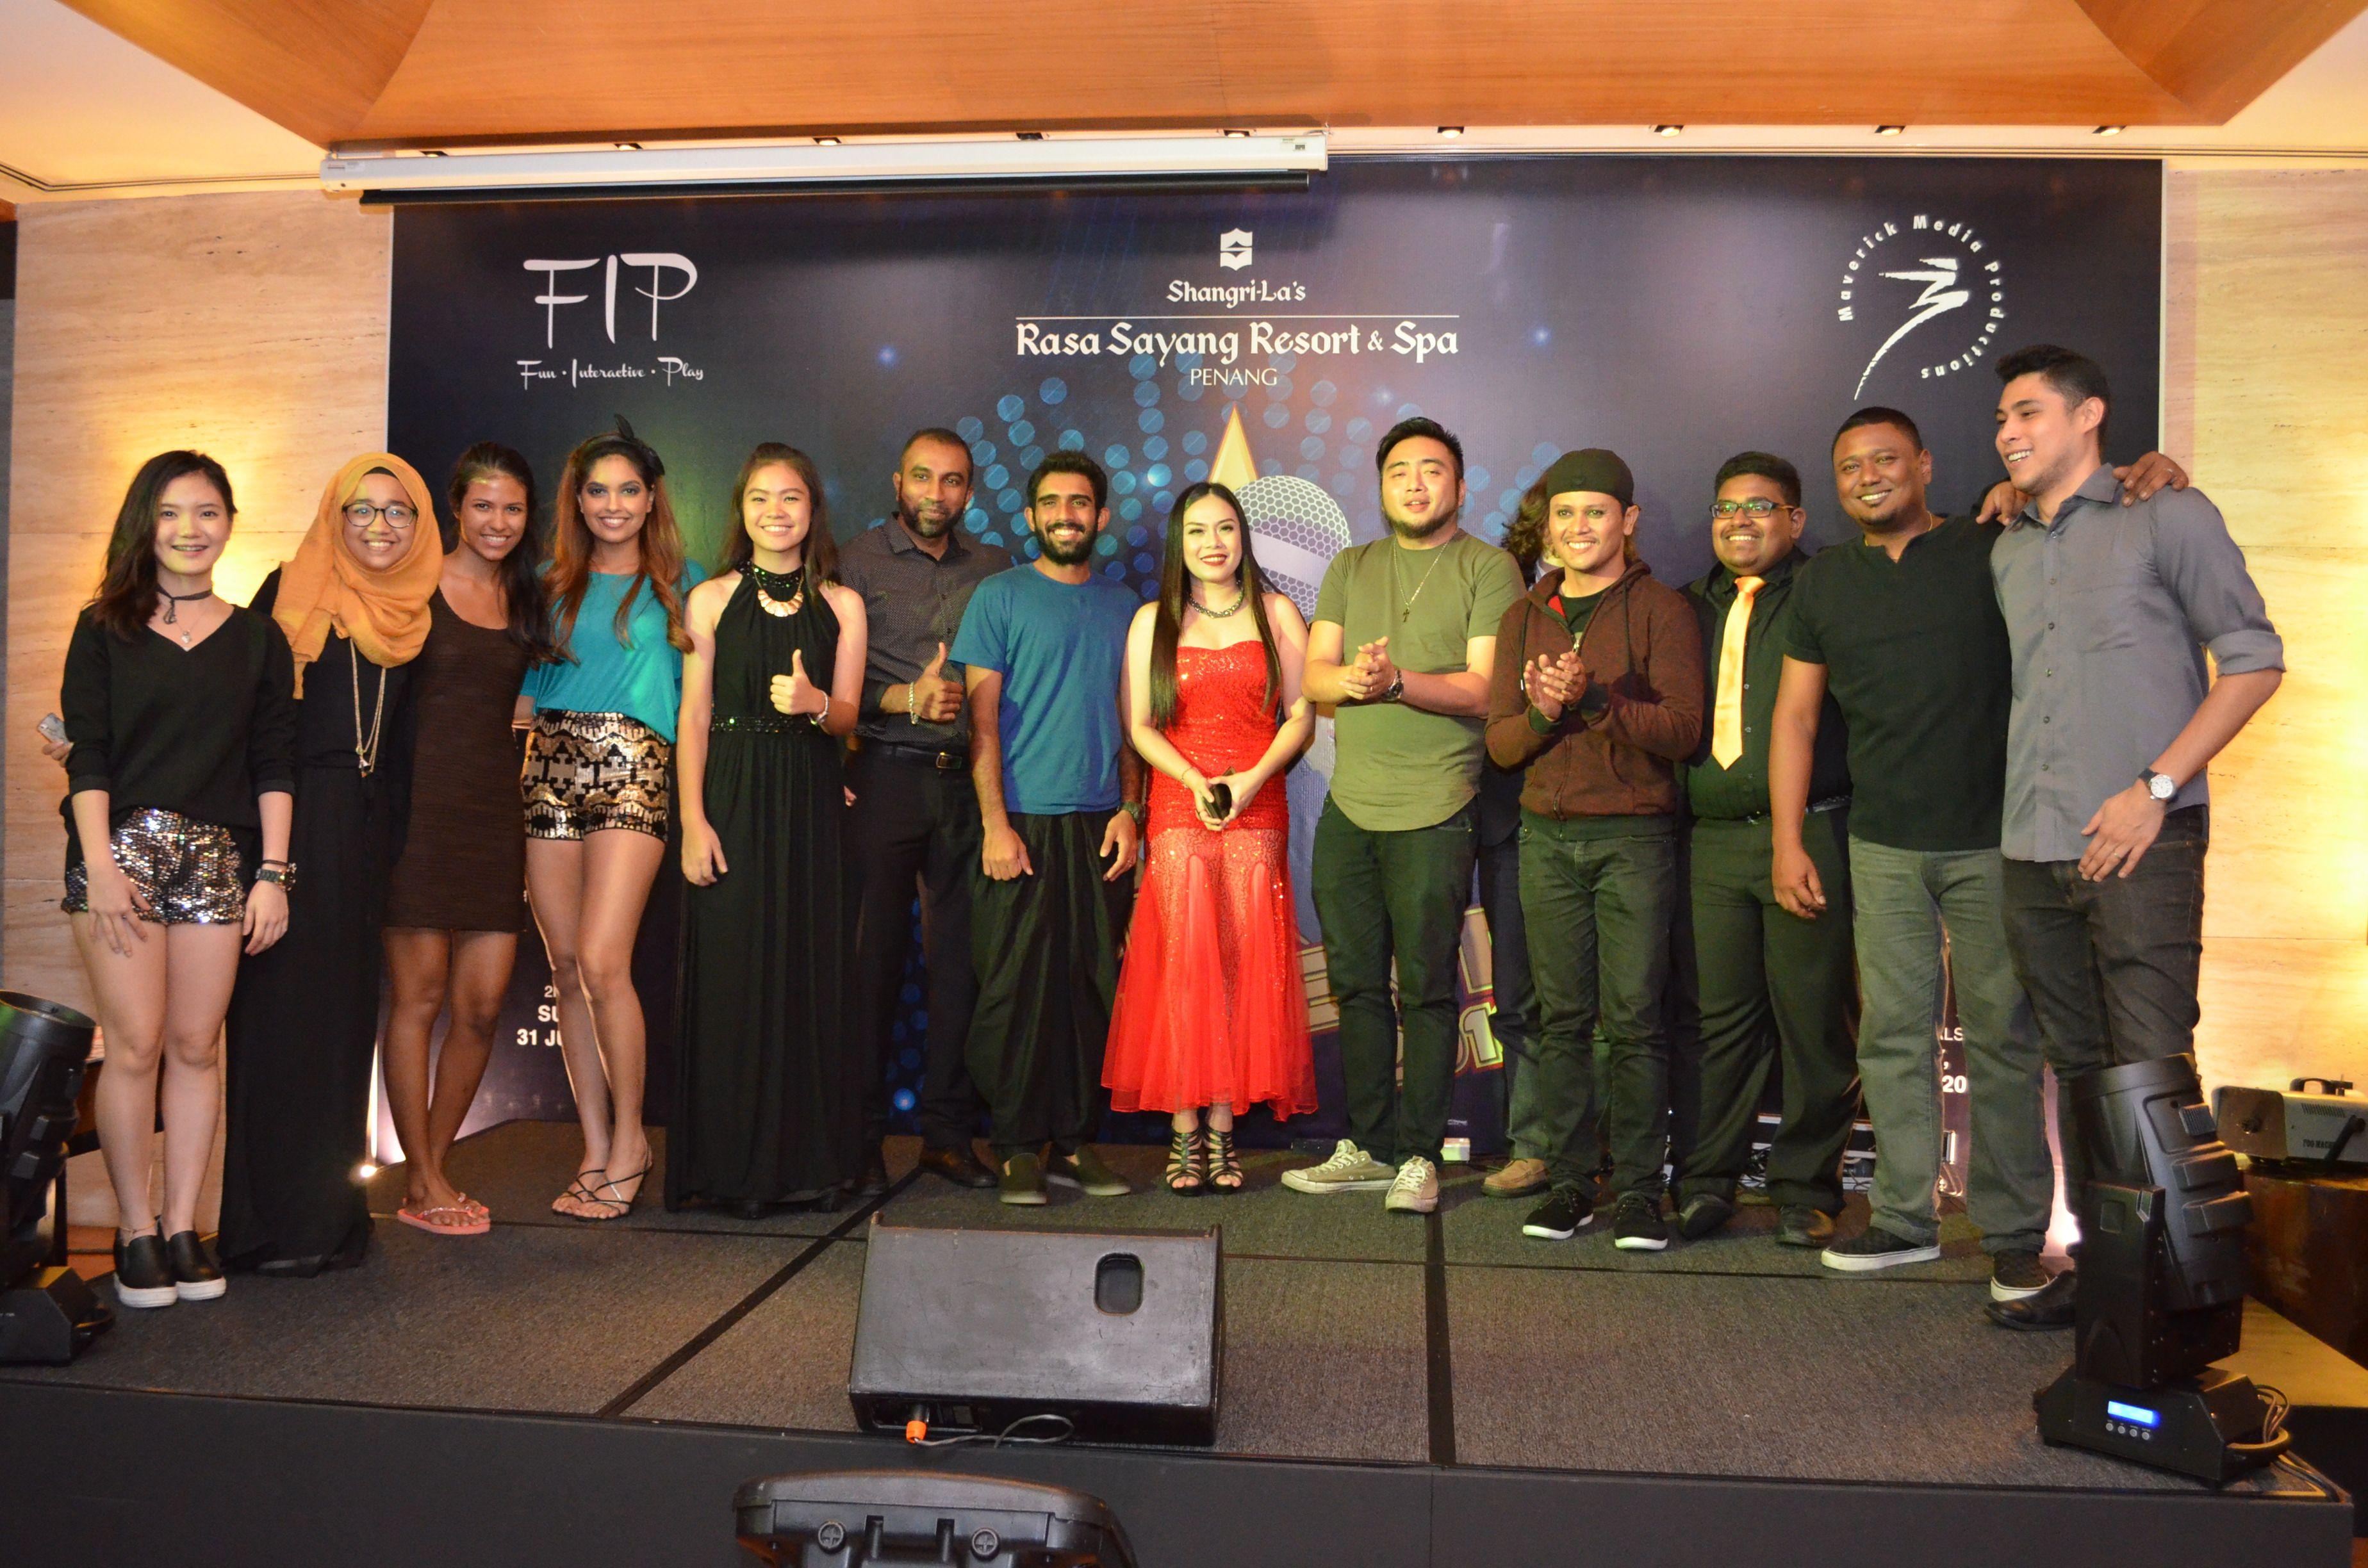 Grand Finals on 28 August 2016 #rasasayangresort